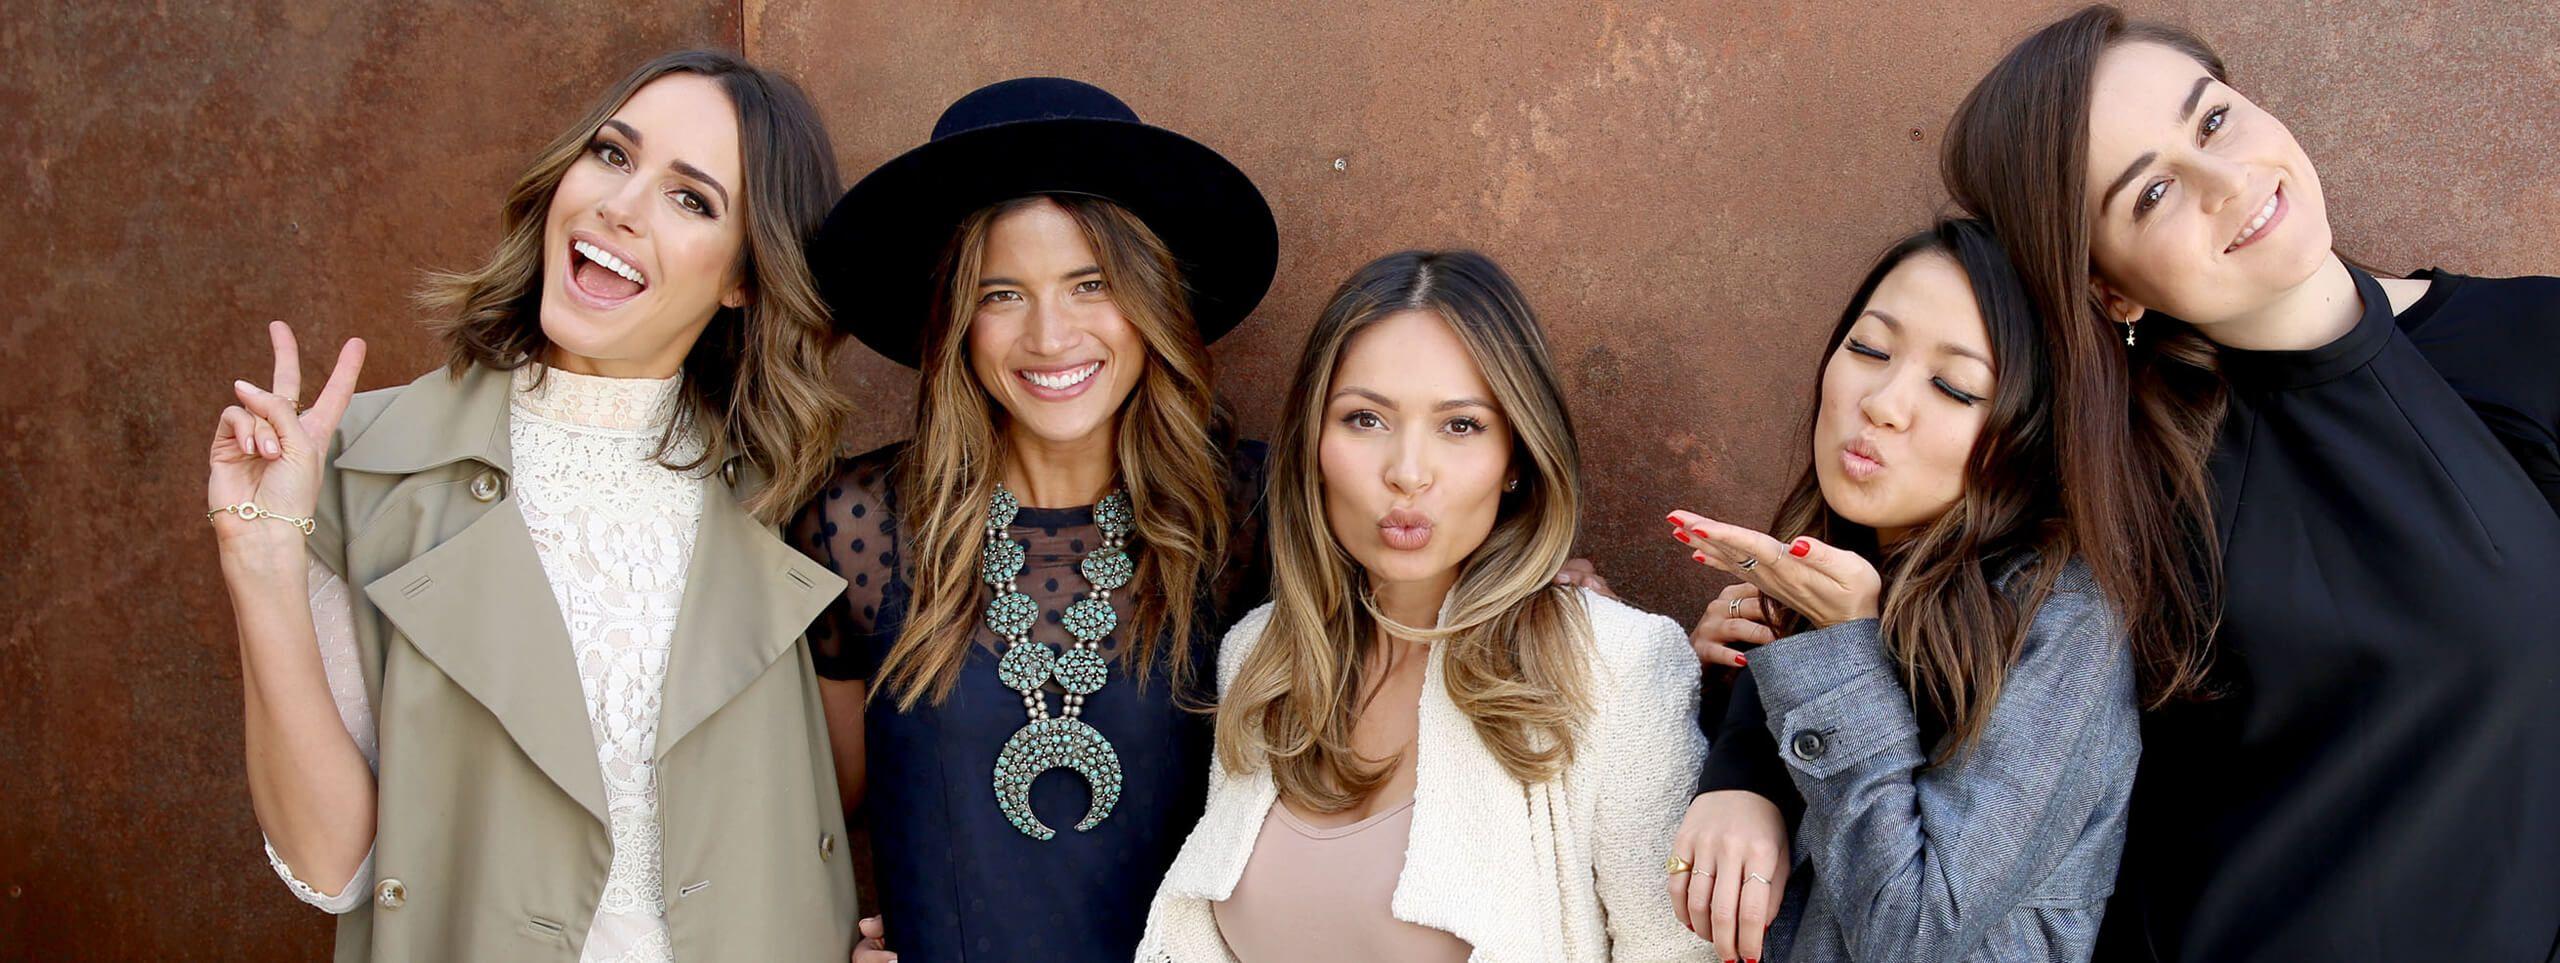 Gruppo di donne con varie acconciature accomunate dall'hair-contouring